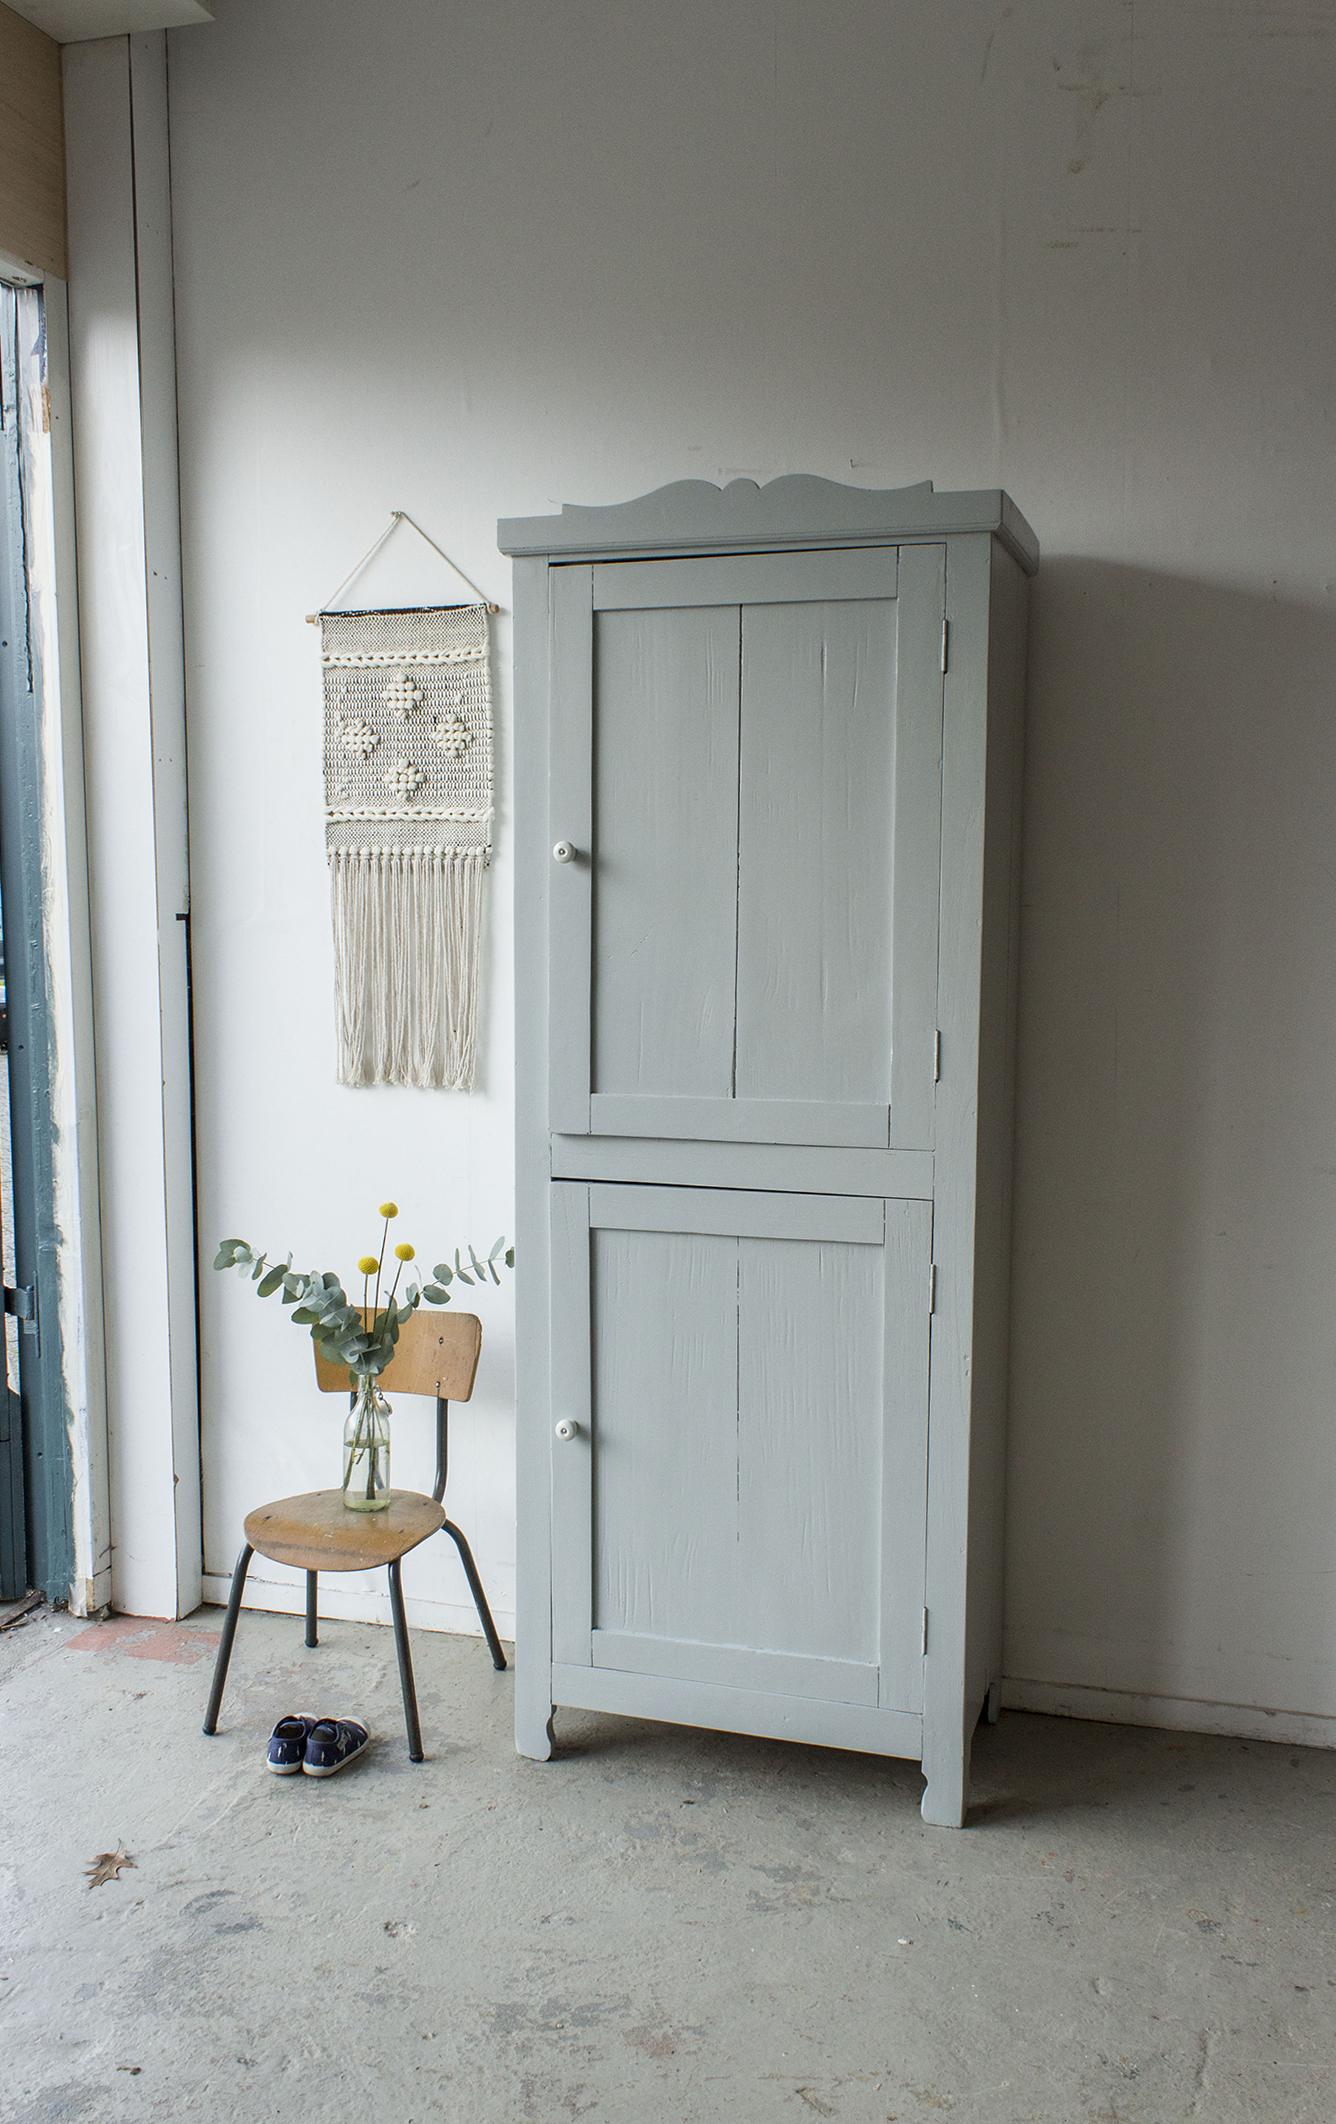 1399 - zachtgrijs vintage kledingkastje - Firma Zoethout.jpg